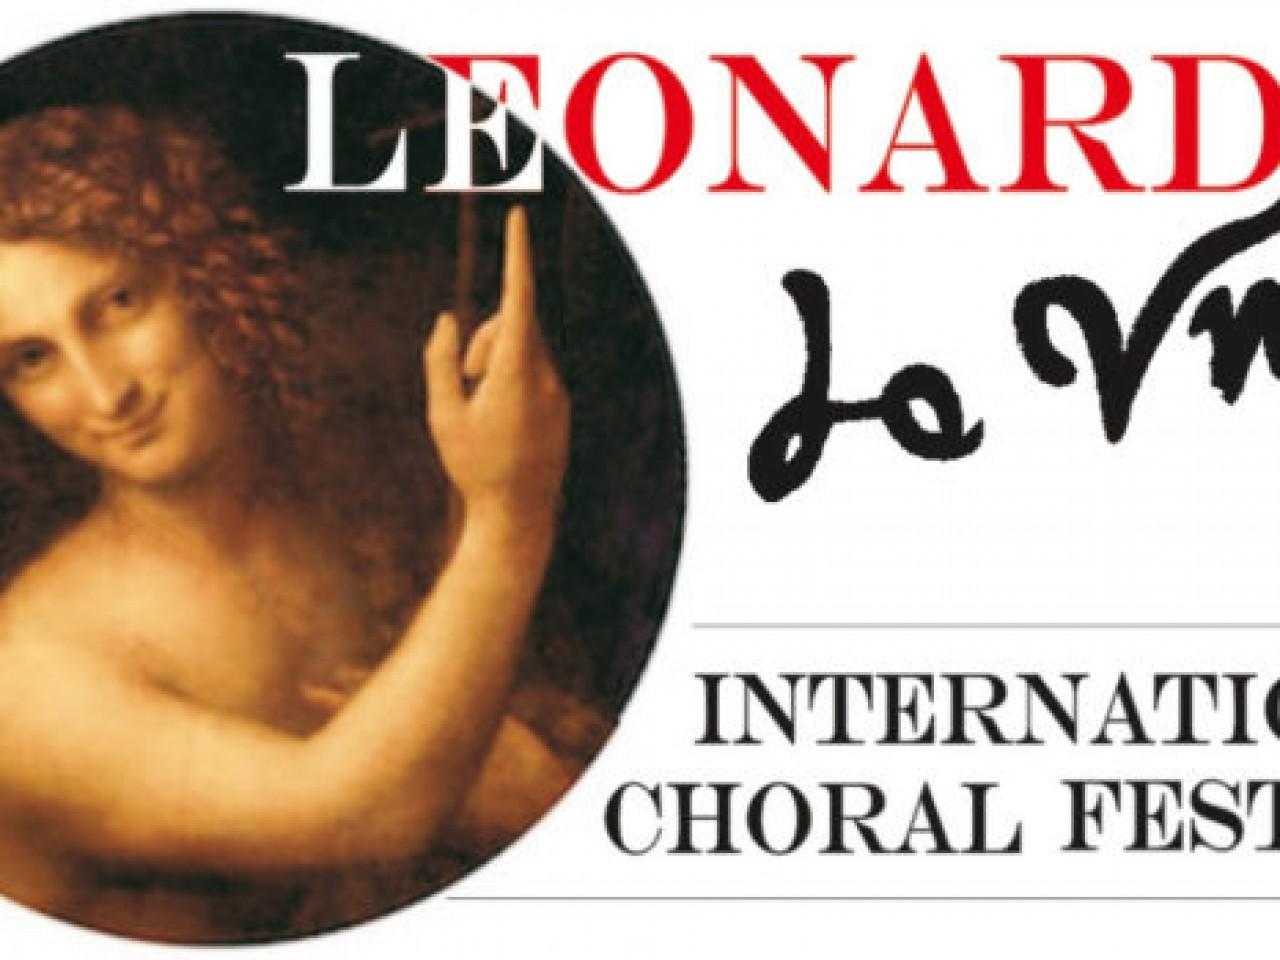 Leonardo da Vinci International Choral Festival, Florence